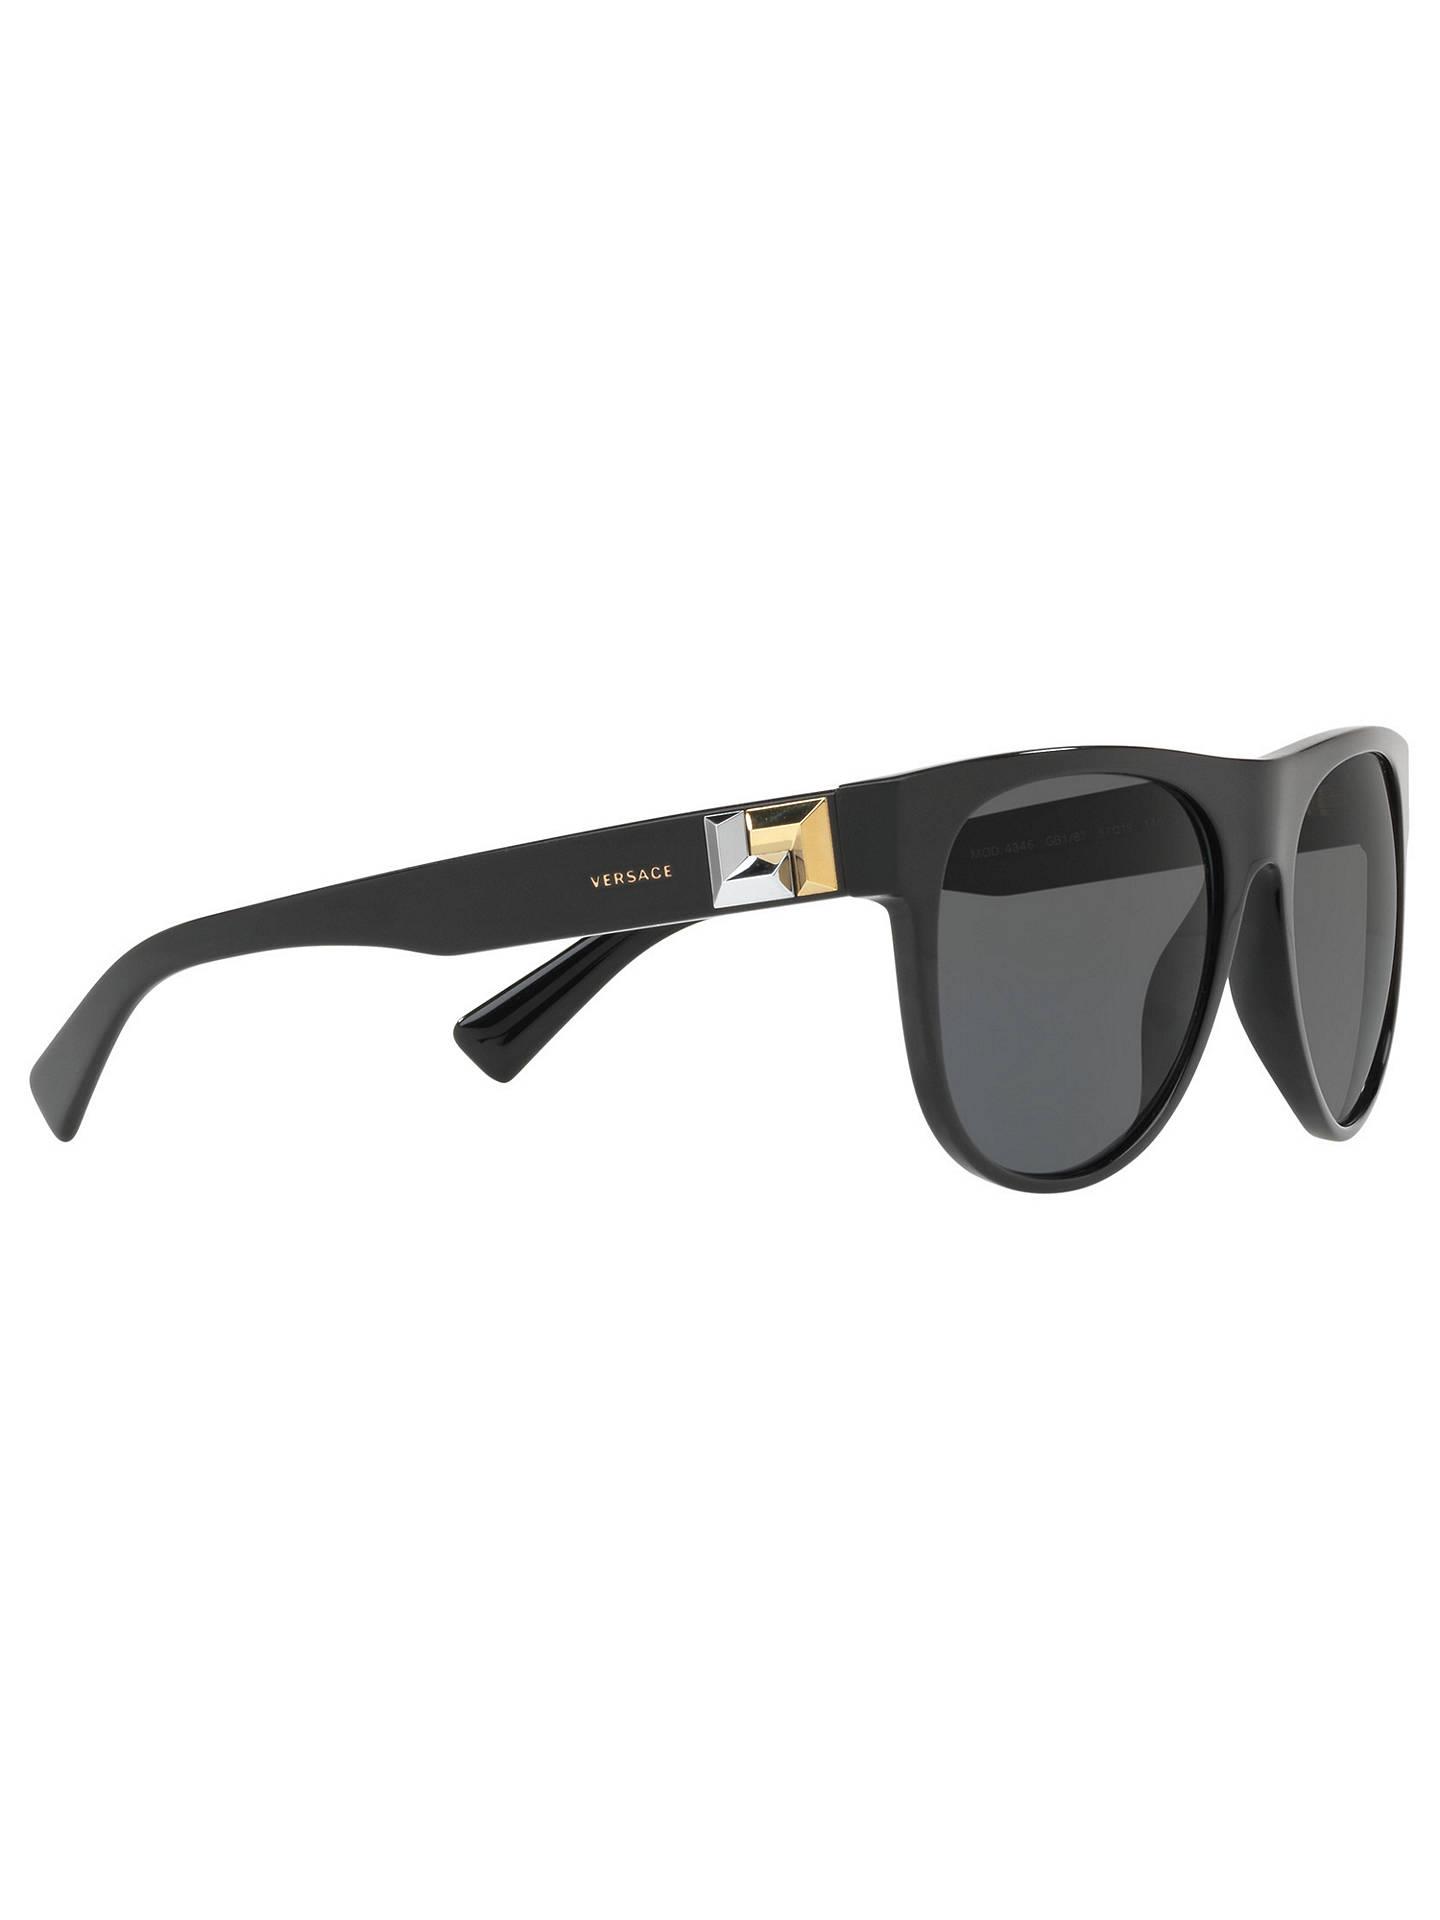 8c60bd1cc98b Versace VE4346 Men s Embellished Square Sunglasses at John Lewis ...